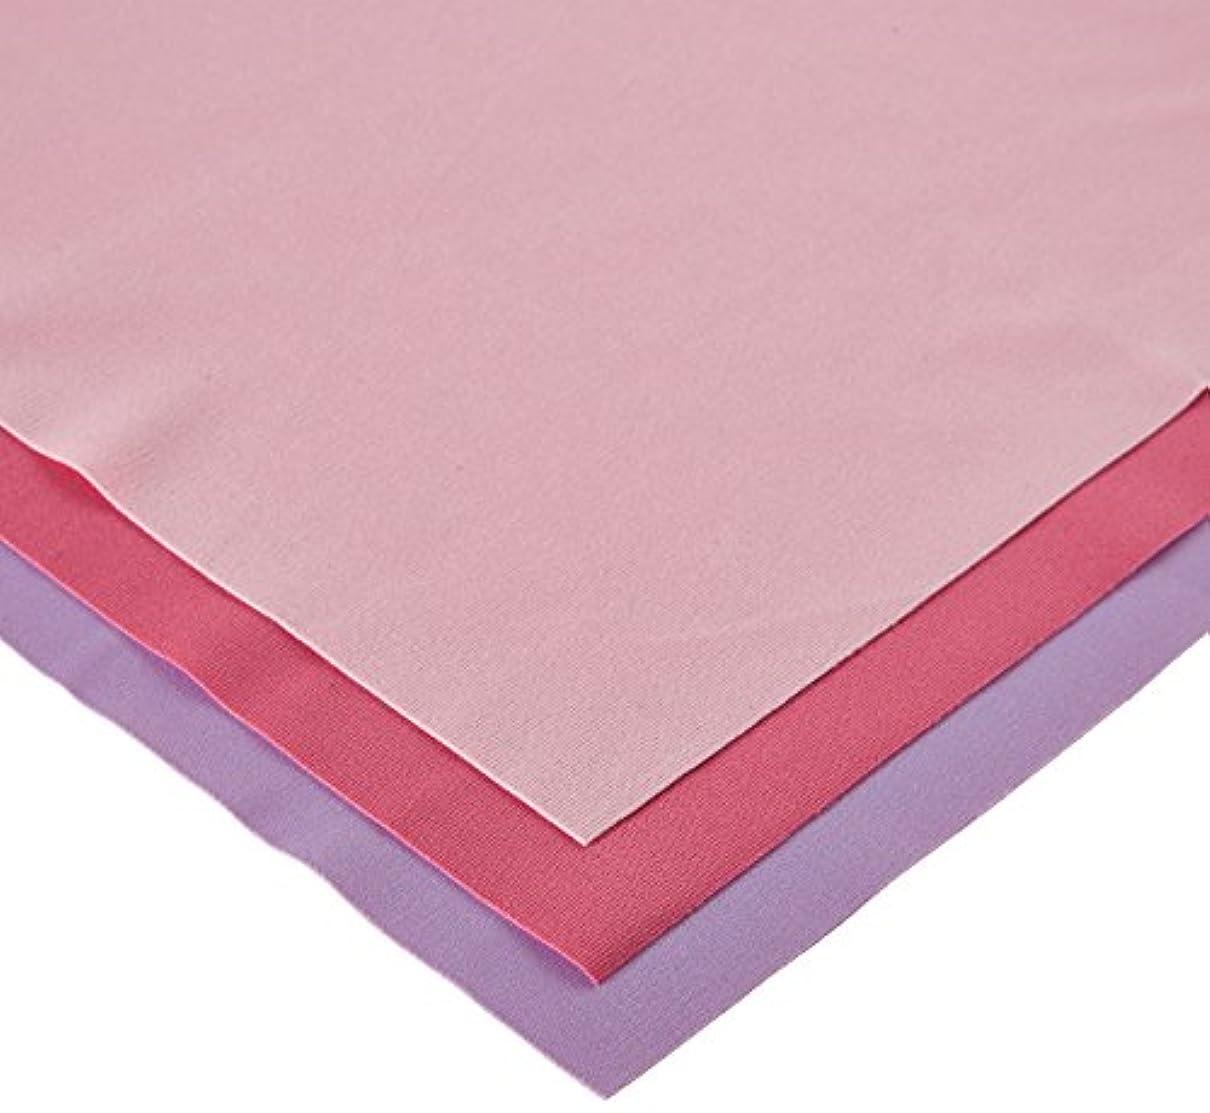 Babyville PUL Waterproof Diaper Fabric 21